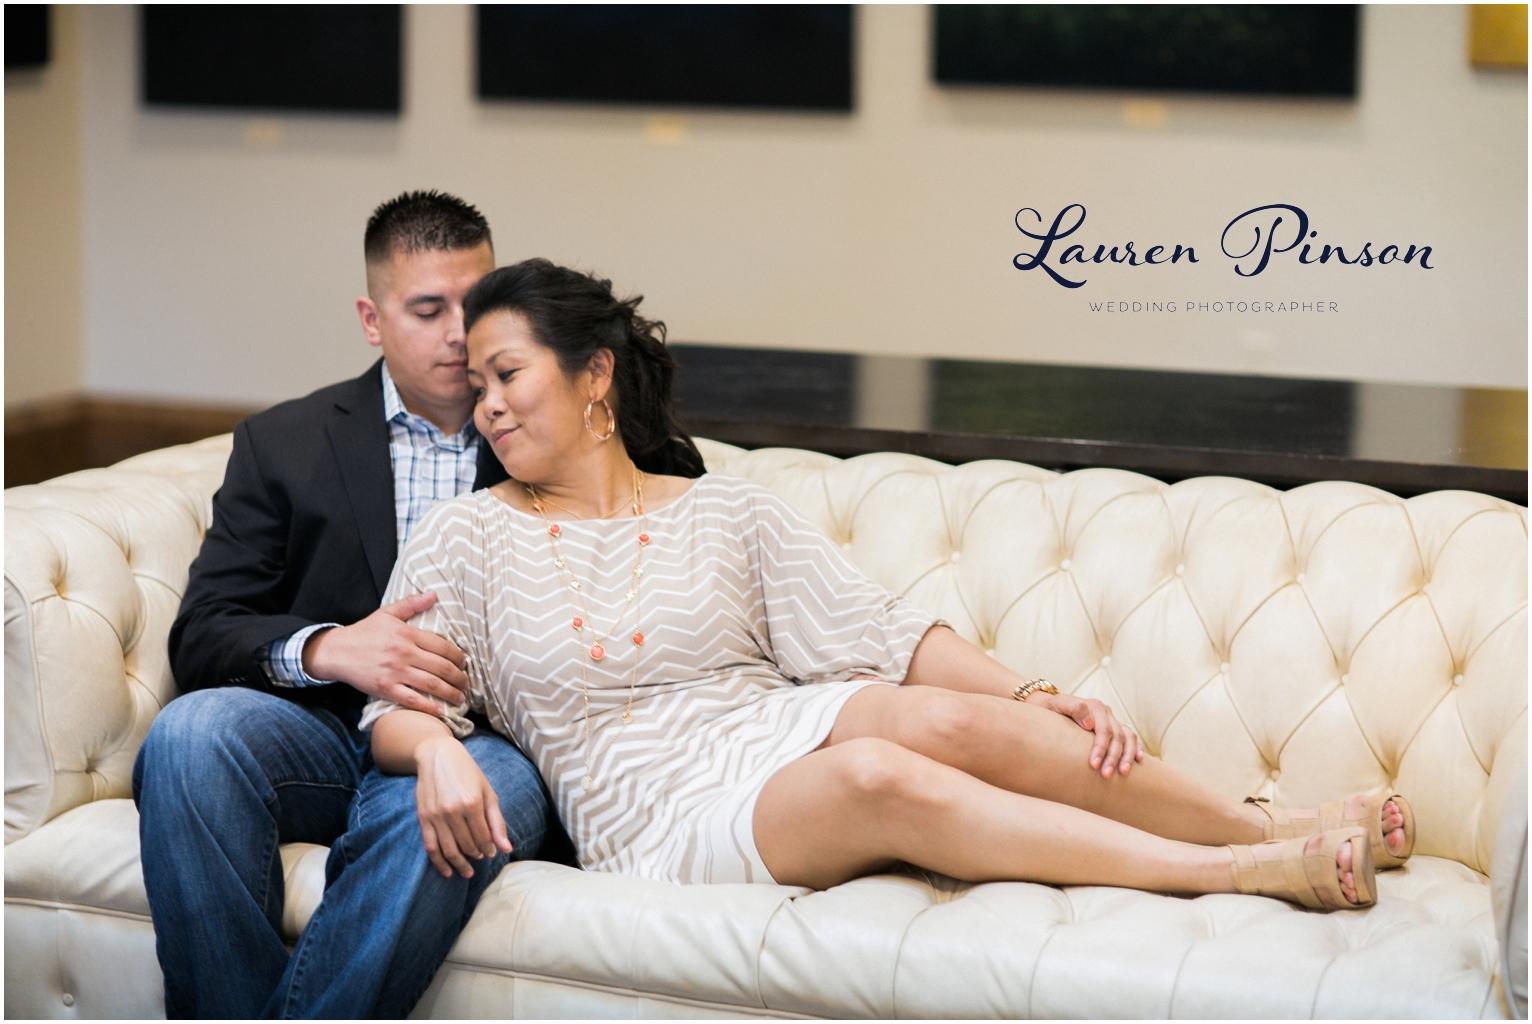 wichita-falls-wedding-photographer-engagement-session-texas-photography-oklahoma-engagement-wedding-photography_0605.jpg